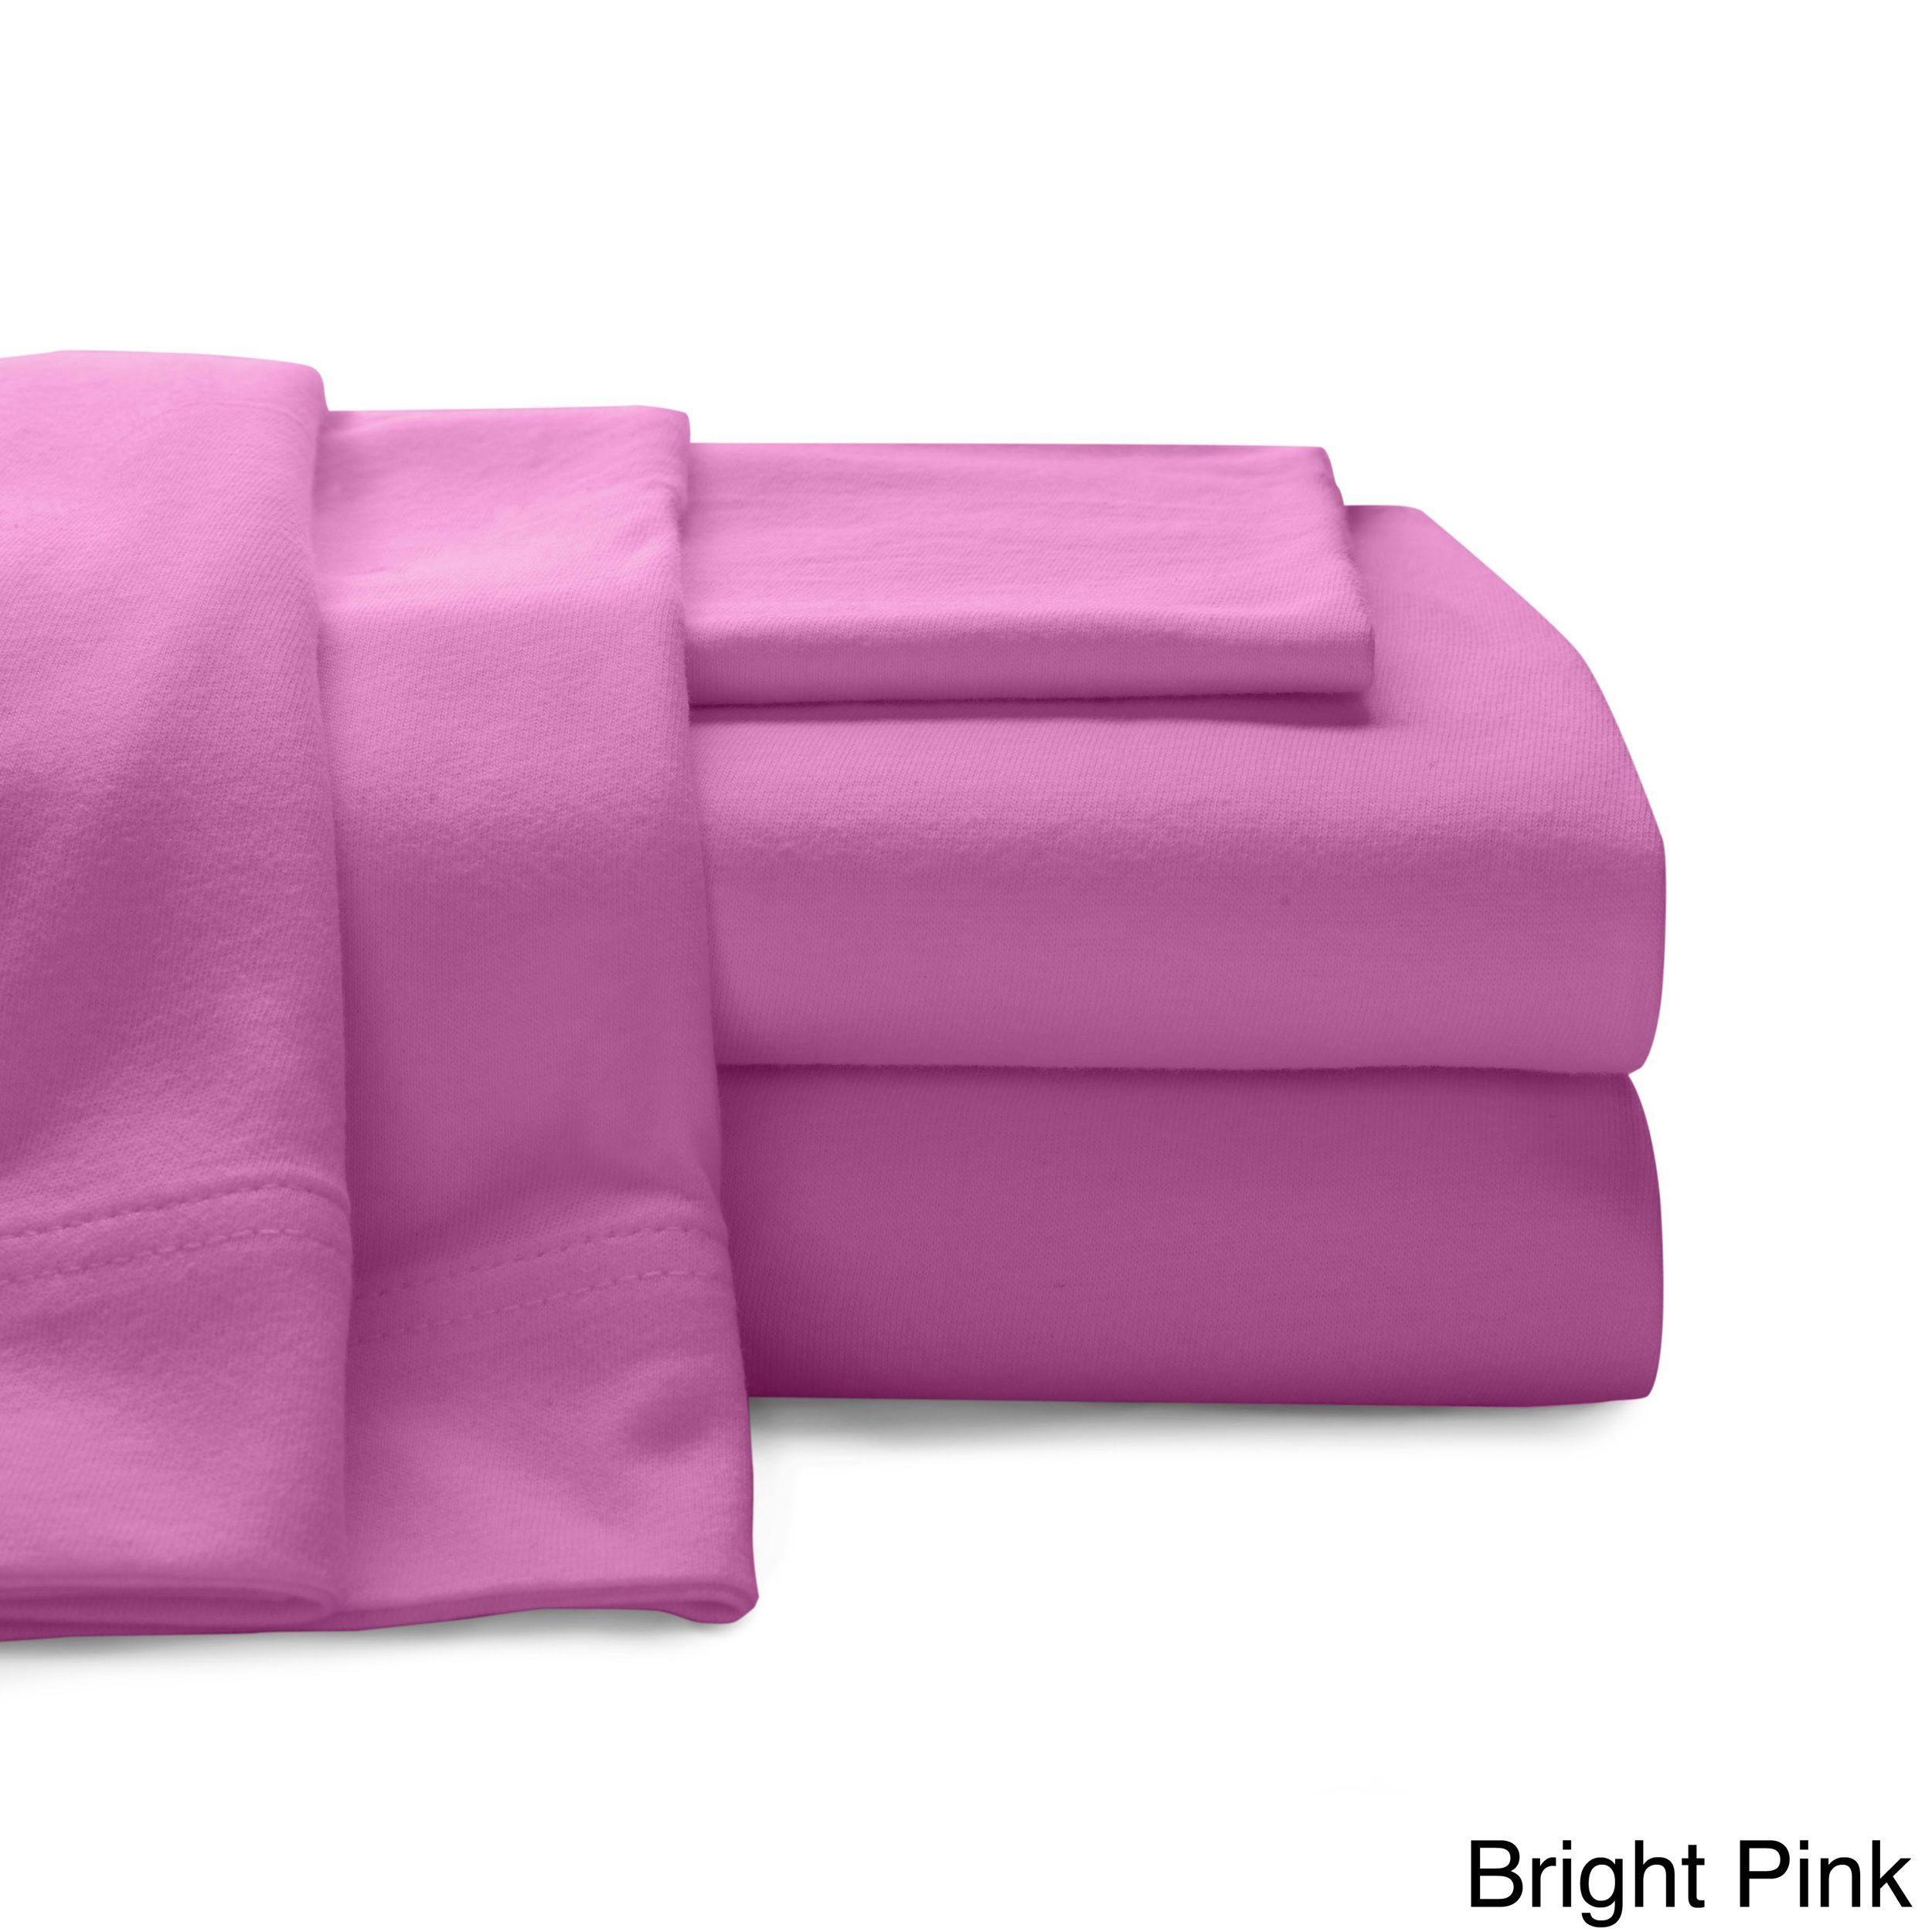 100 Percent Cotton Luxury Jersey Bed Sheet Set Cotton Sheet Sets